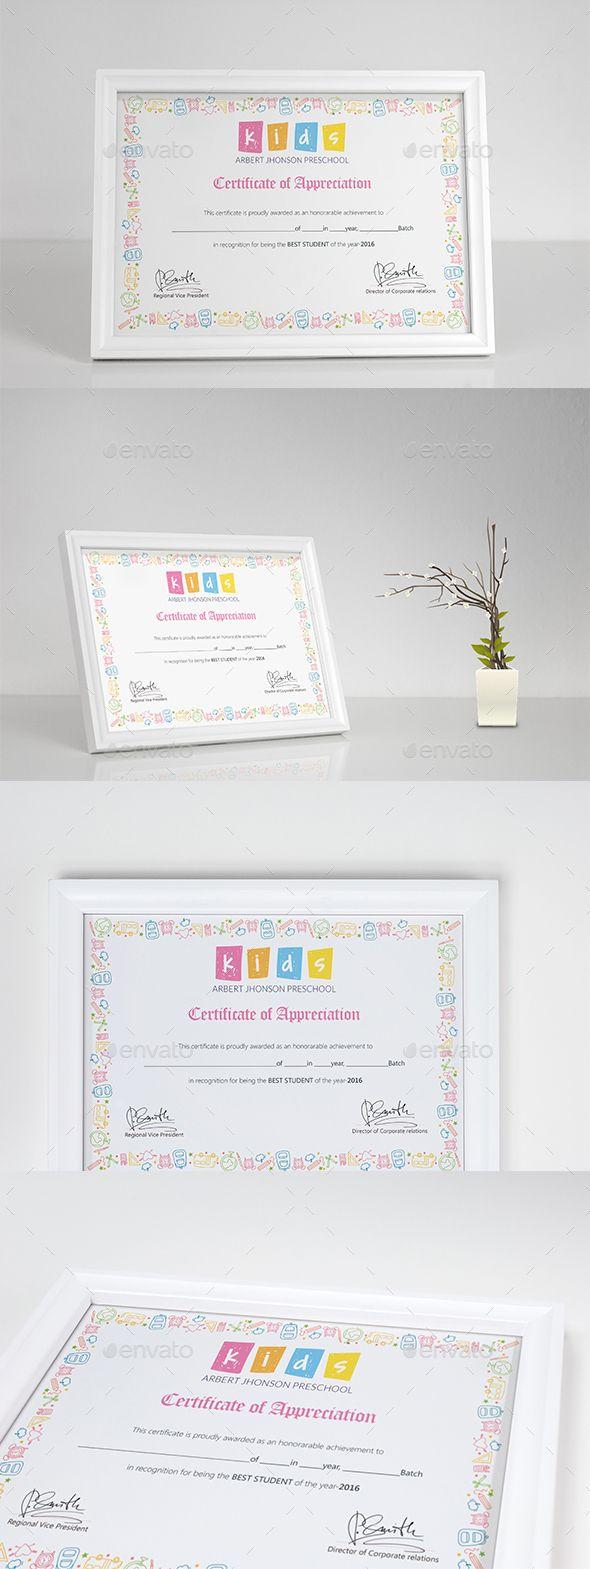 17 best ideas about certificate templates on pinterest